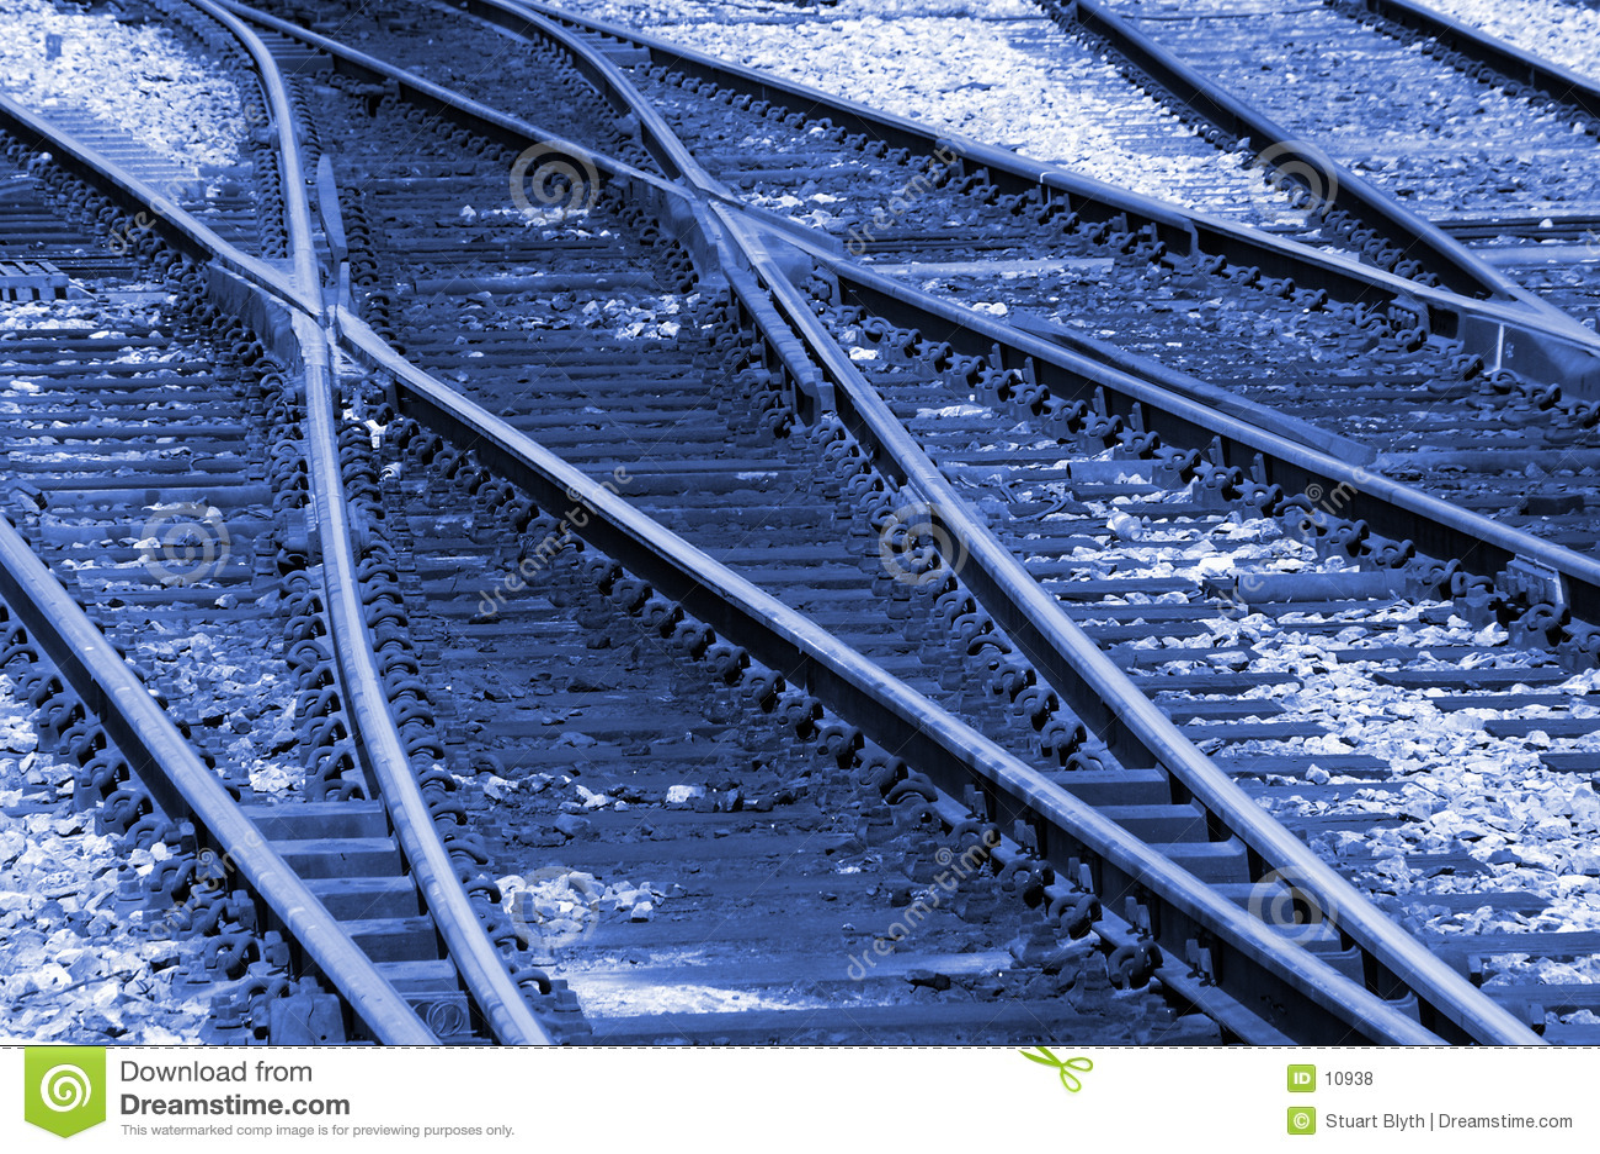 Changing Tracks